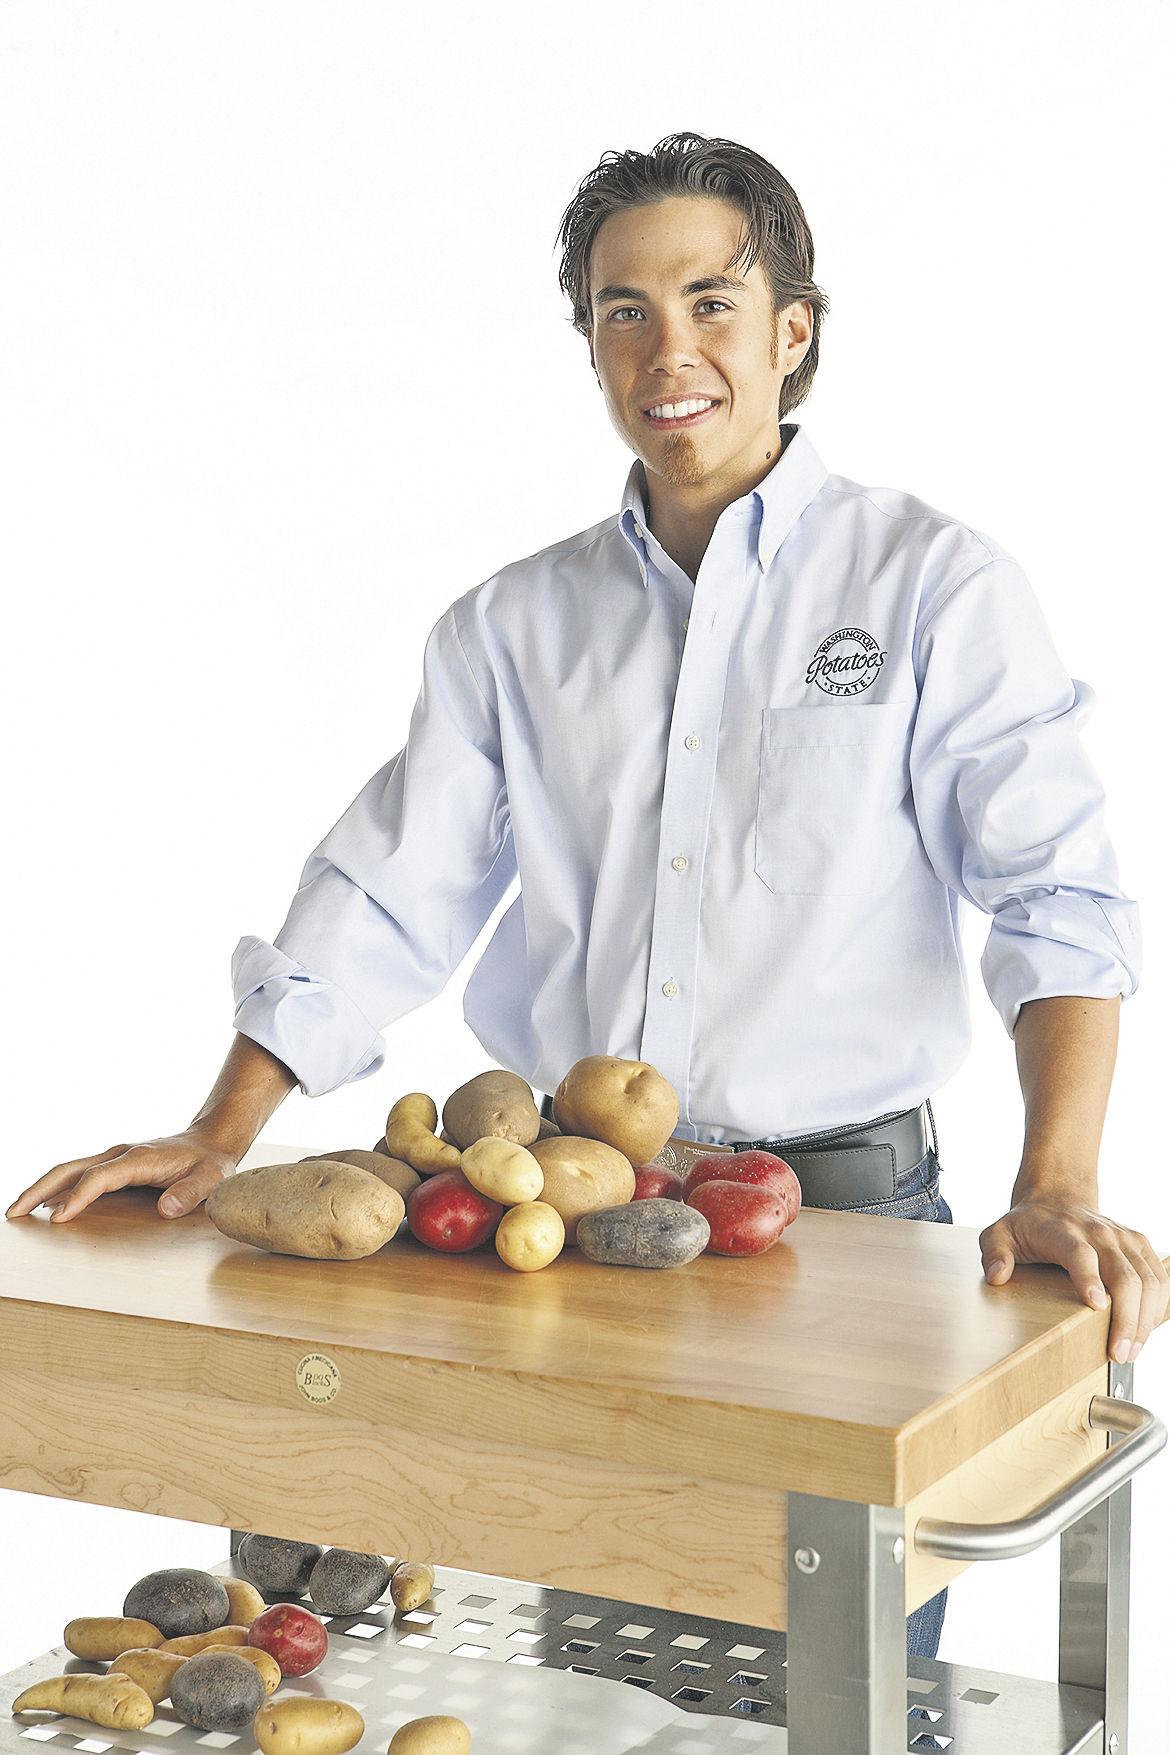 Skater promotes potatoes